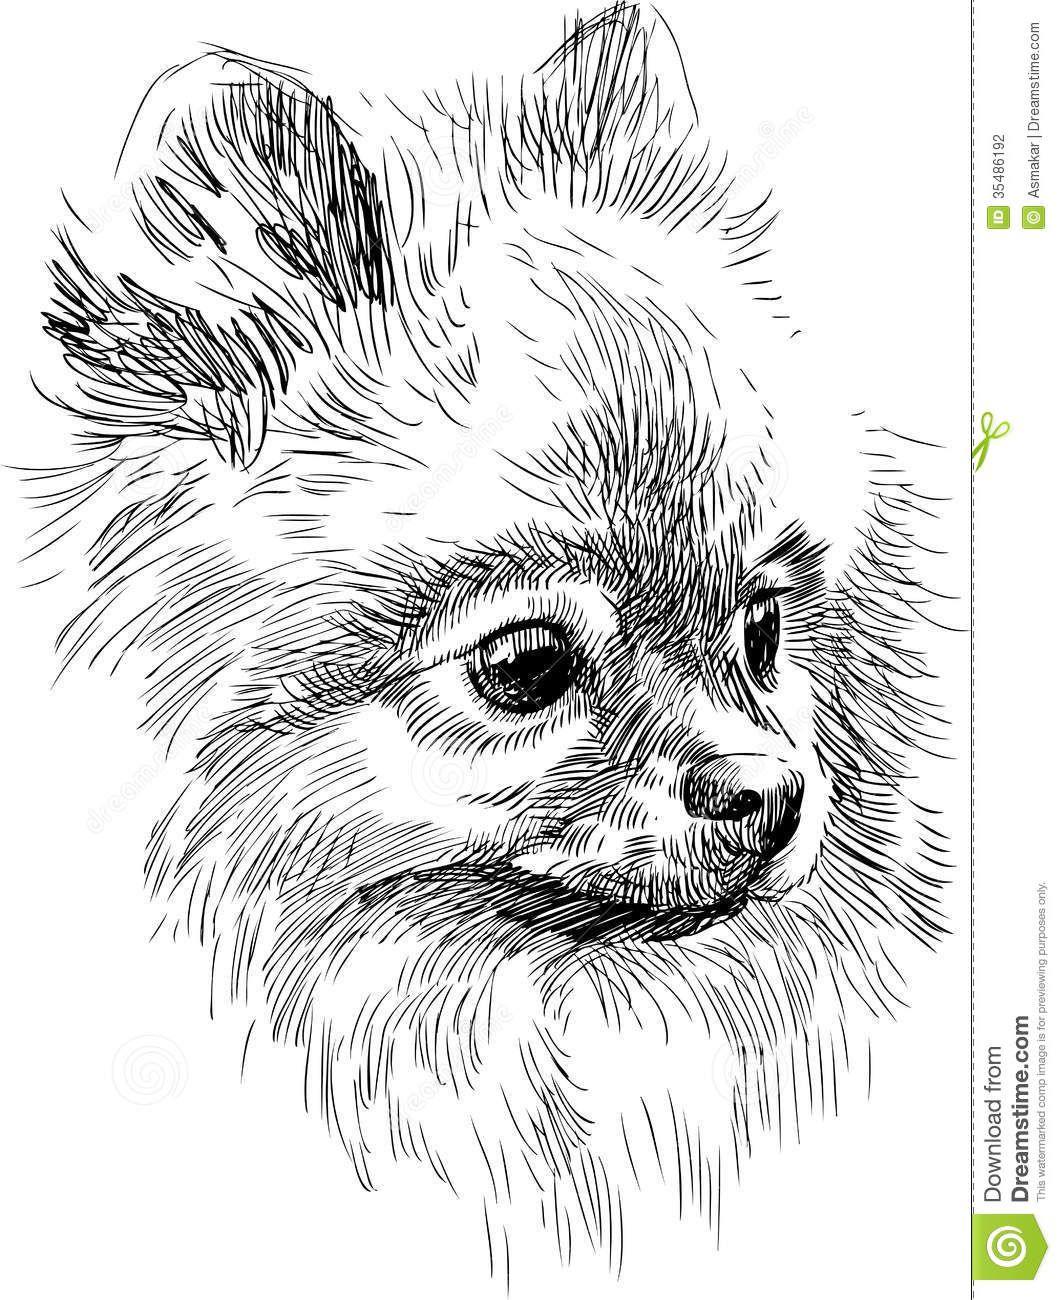 Pomeranian Puppy Sketches